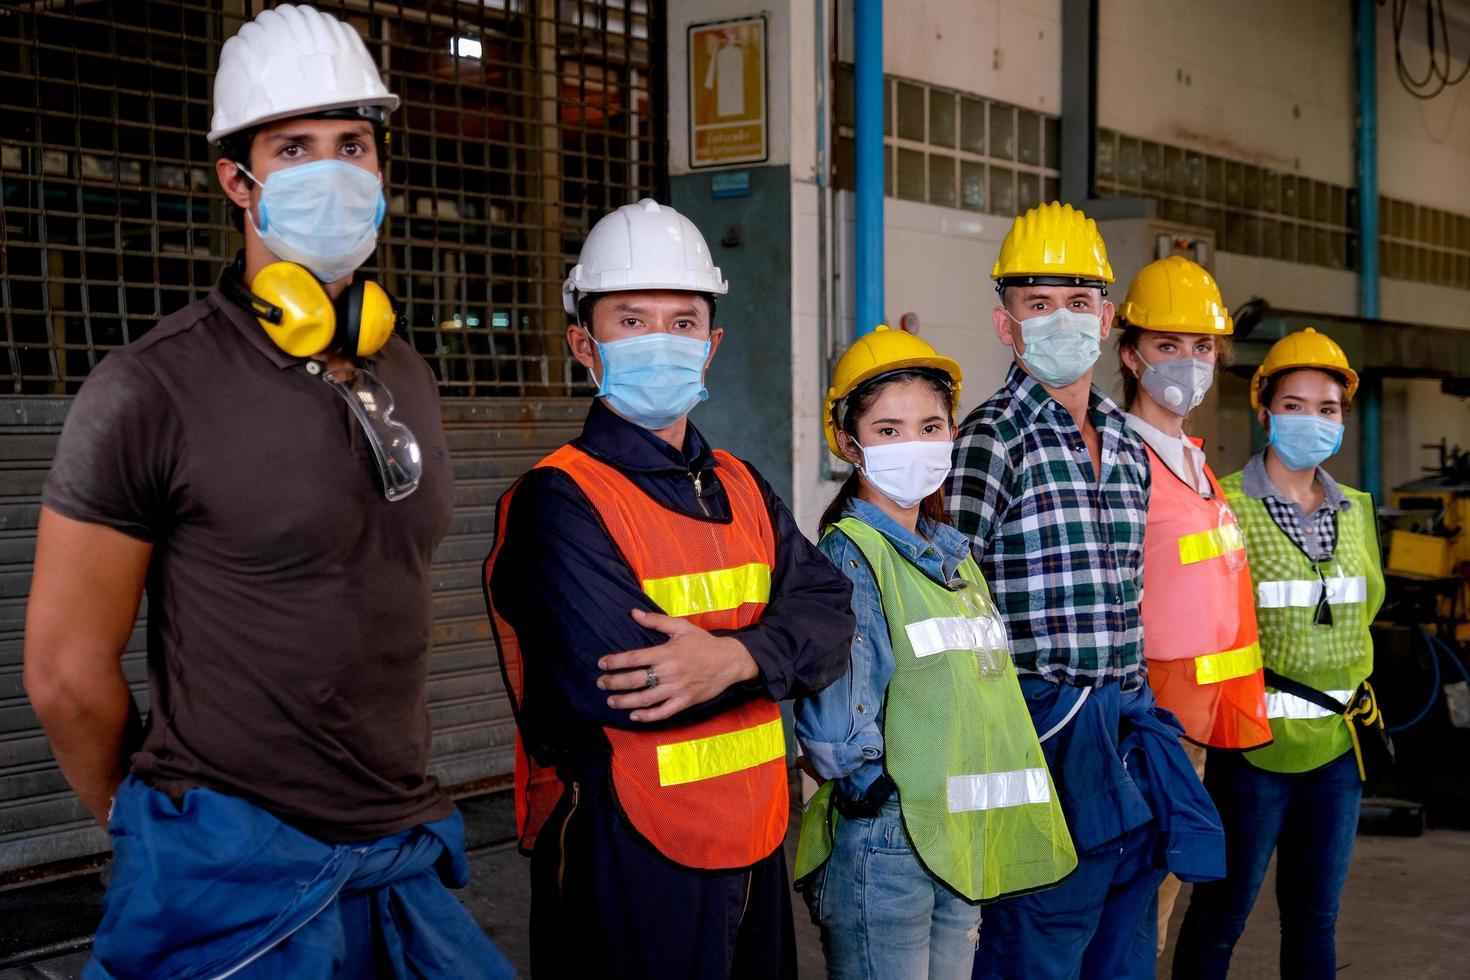 professionele industriële arbeiders staan samen foto